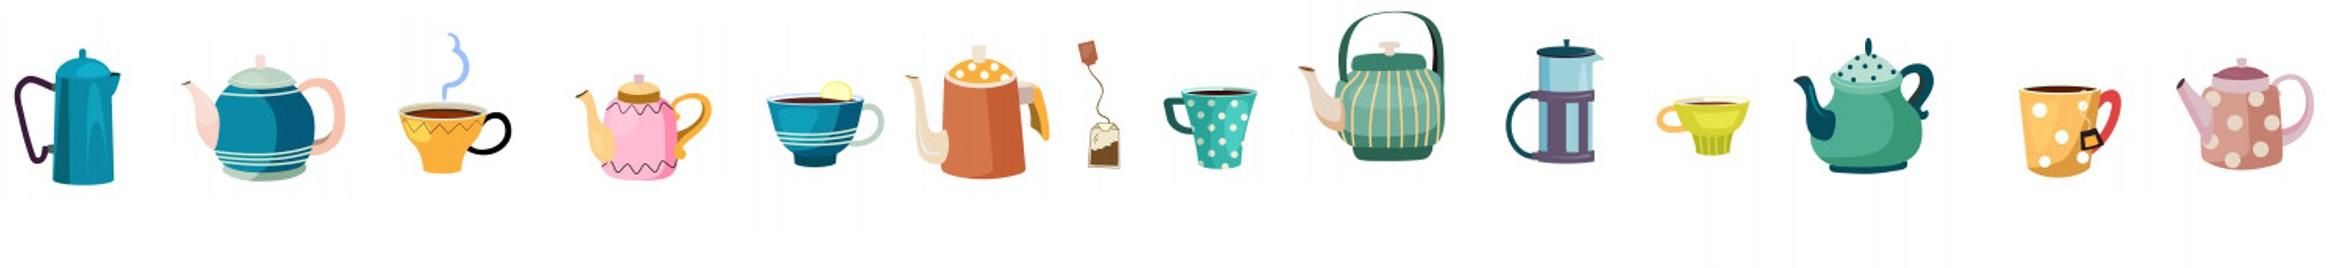 Tea-Party-line-up.jpg